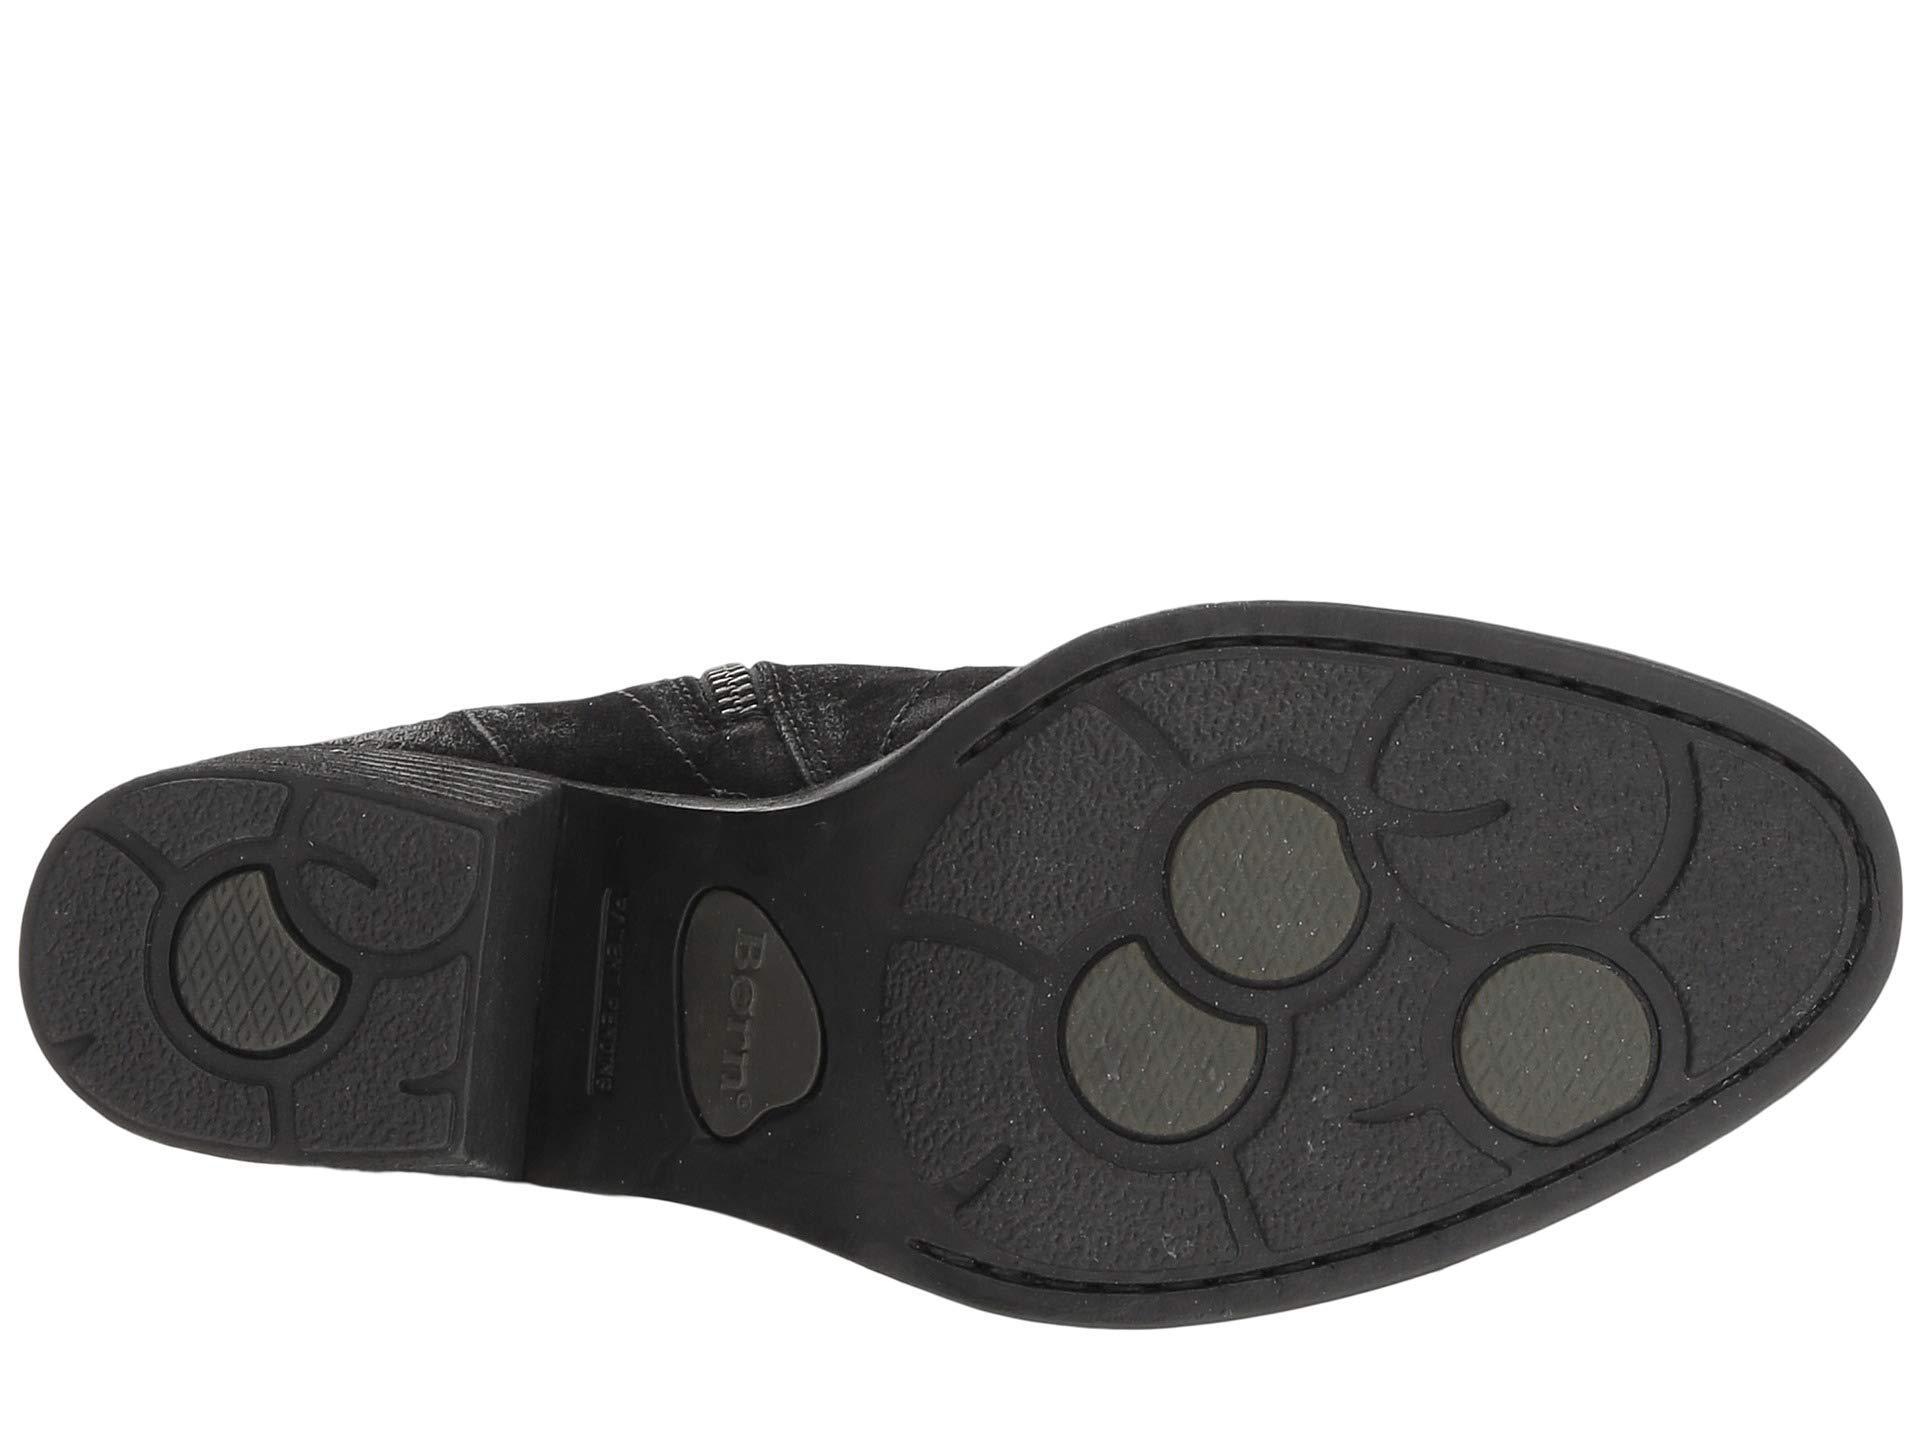 64a410208e6d Born - Felicia (black Distressed) Women s Pull-on Boots - Lyst. View  fullscreen